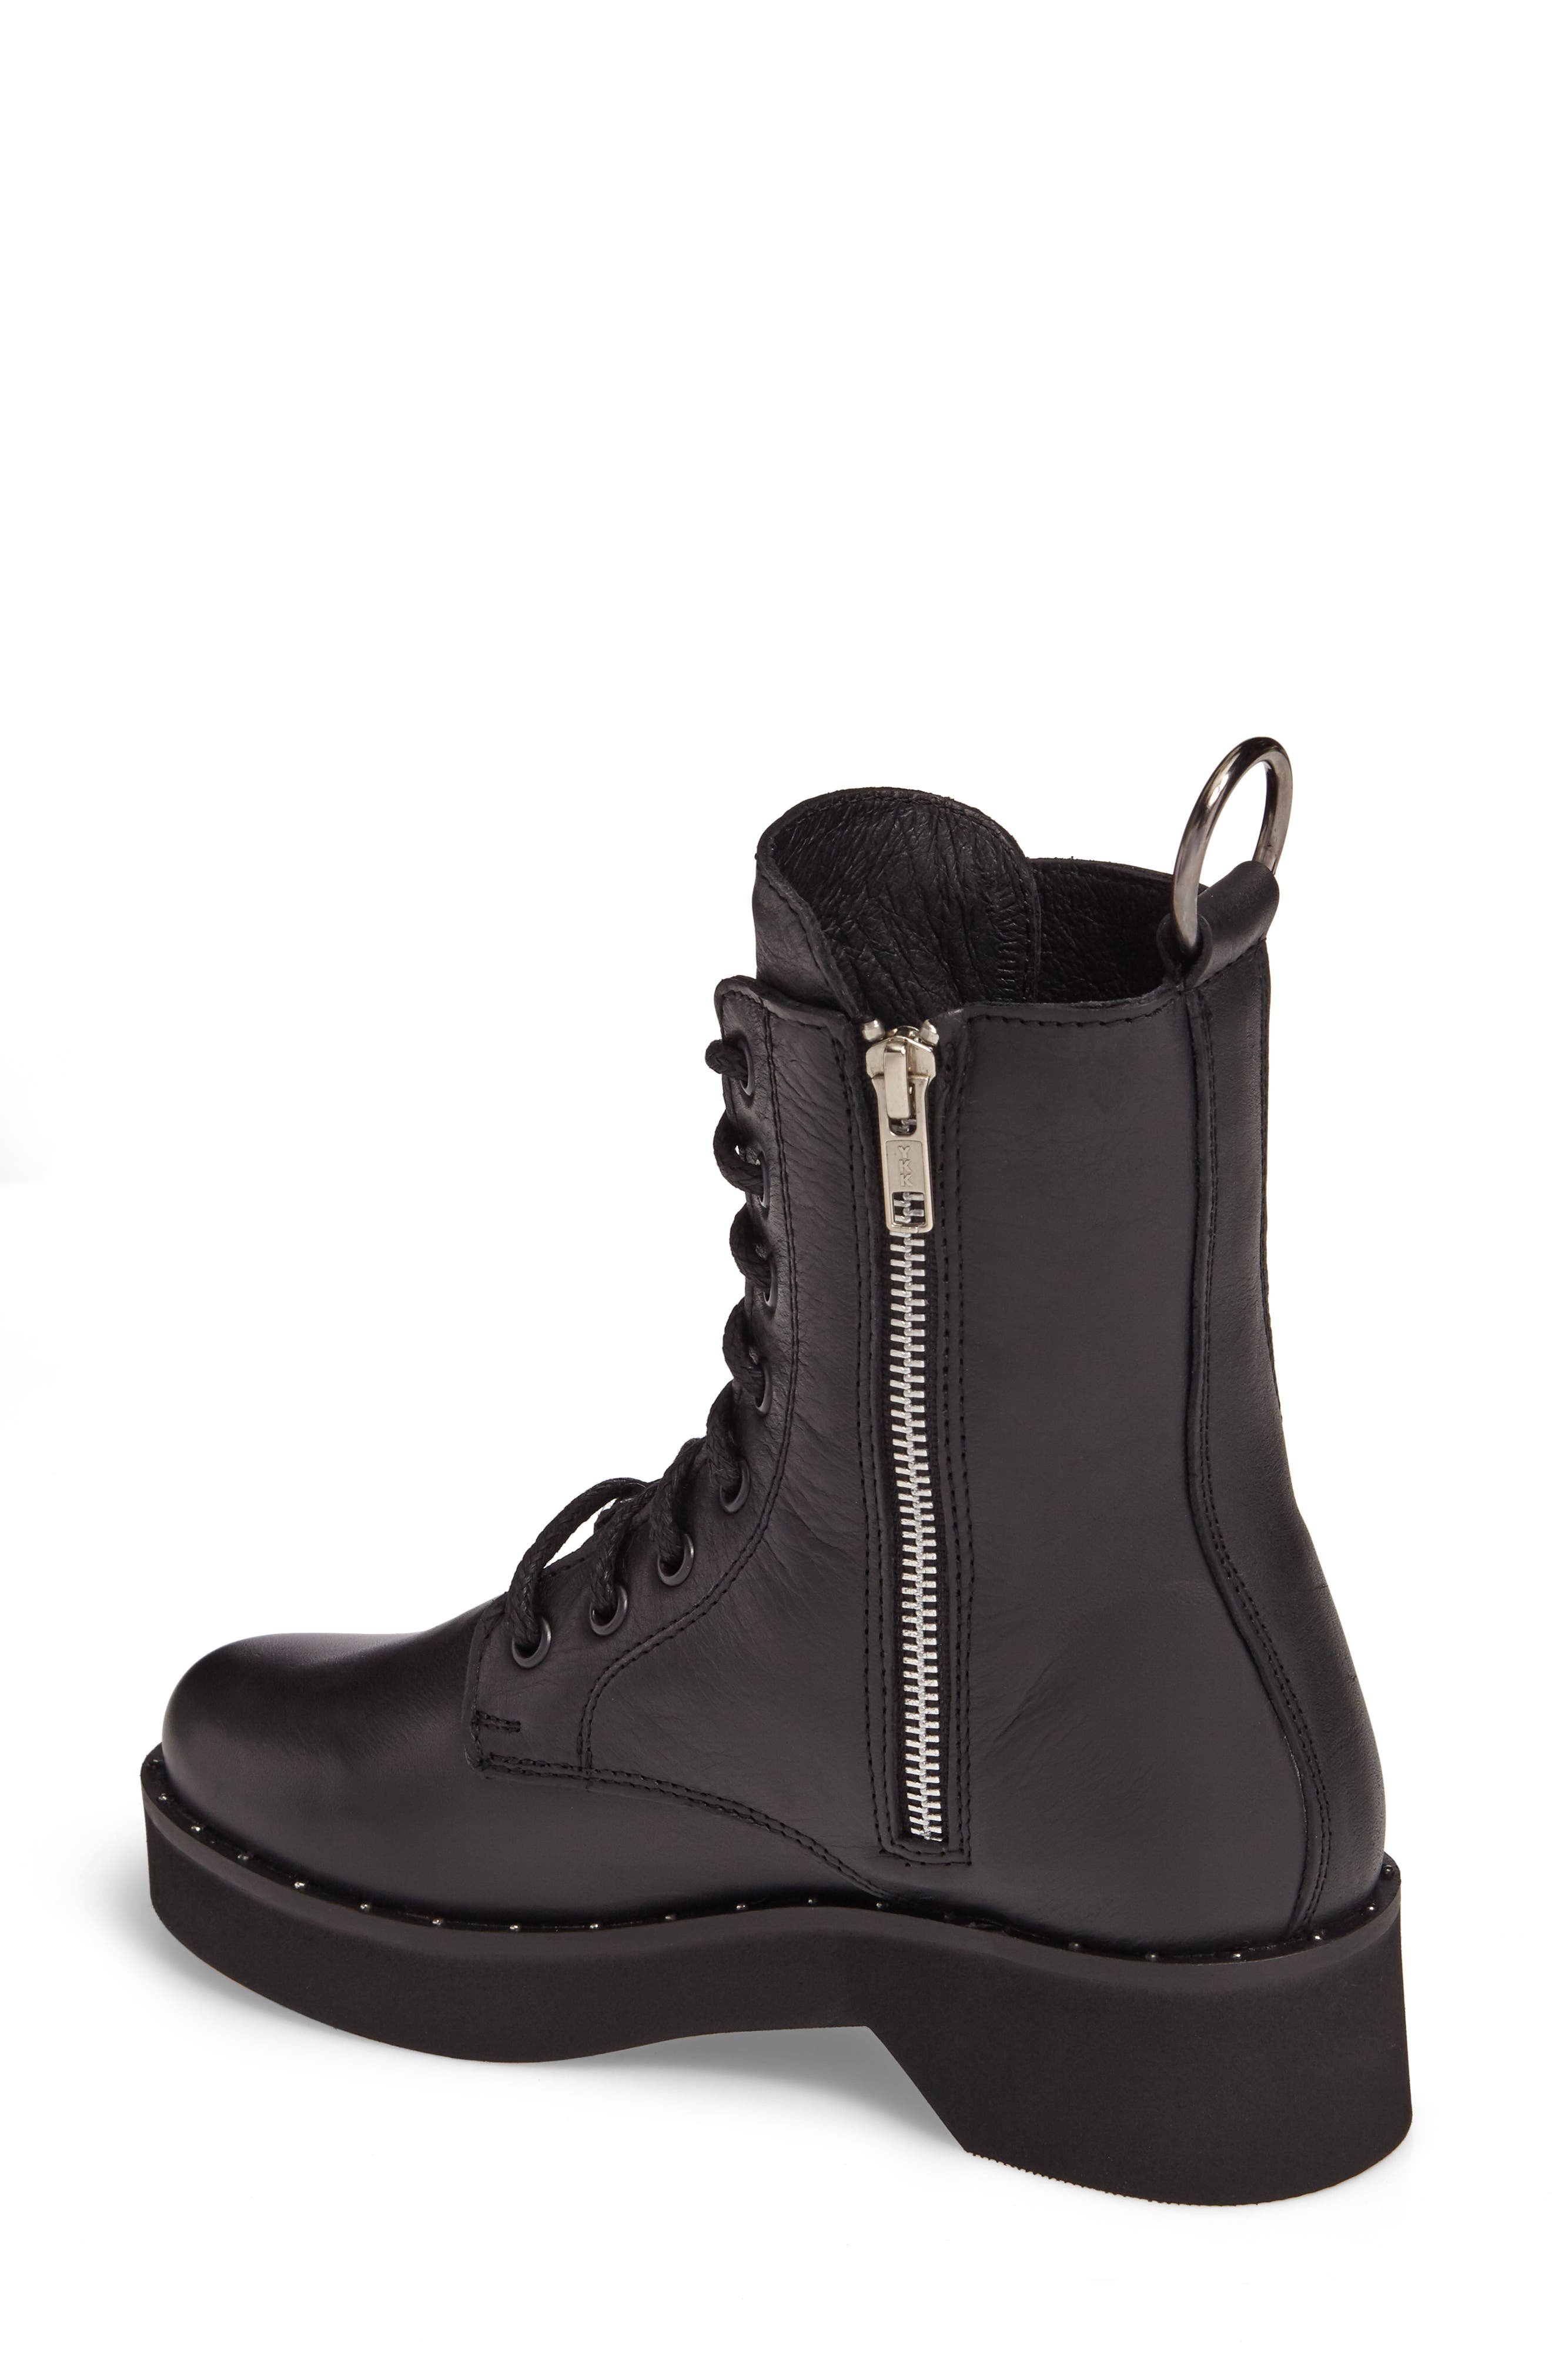 Rocco Combat Boot,                             Alternate thumbnail 2, color,                             Black Leather